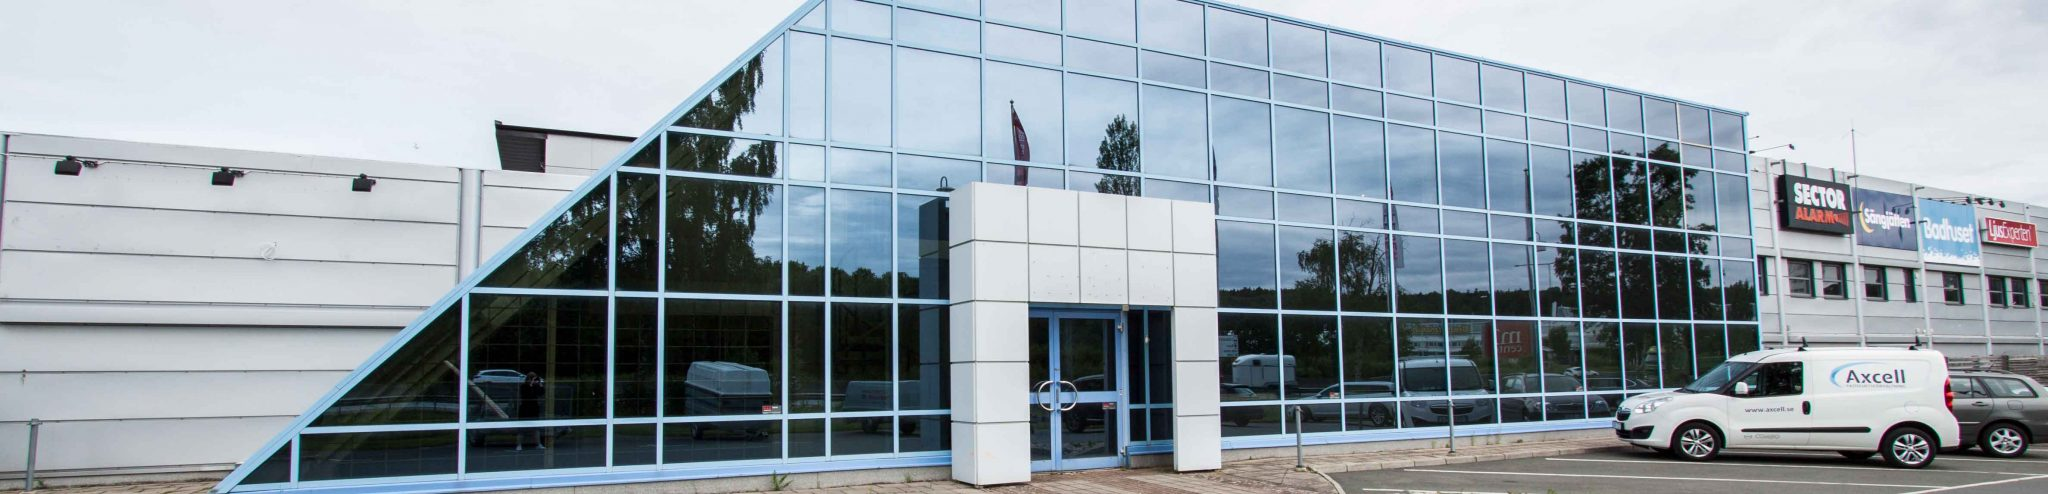 Ledig kontorslokal mitt på Elmia i Jönköping